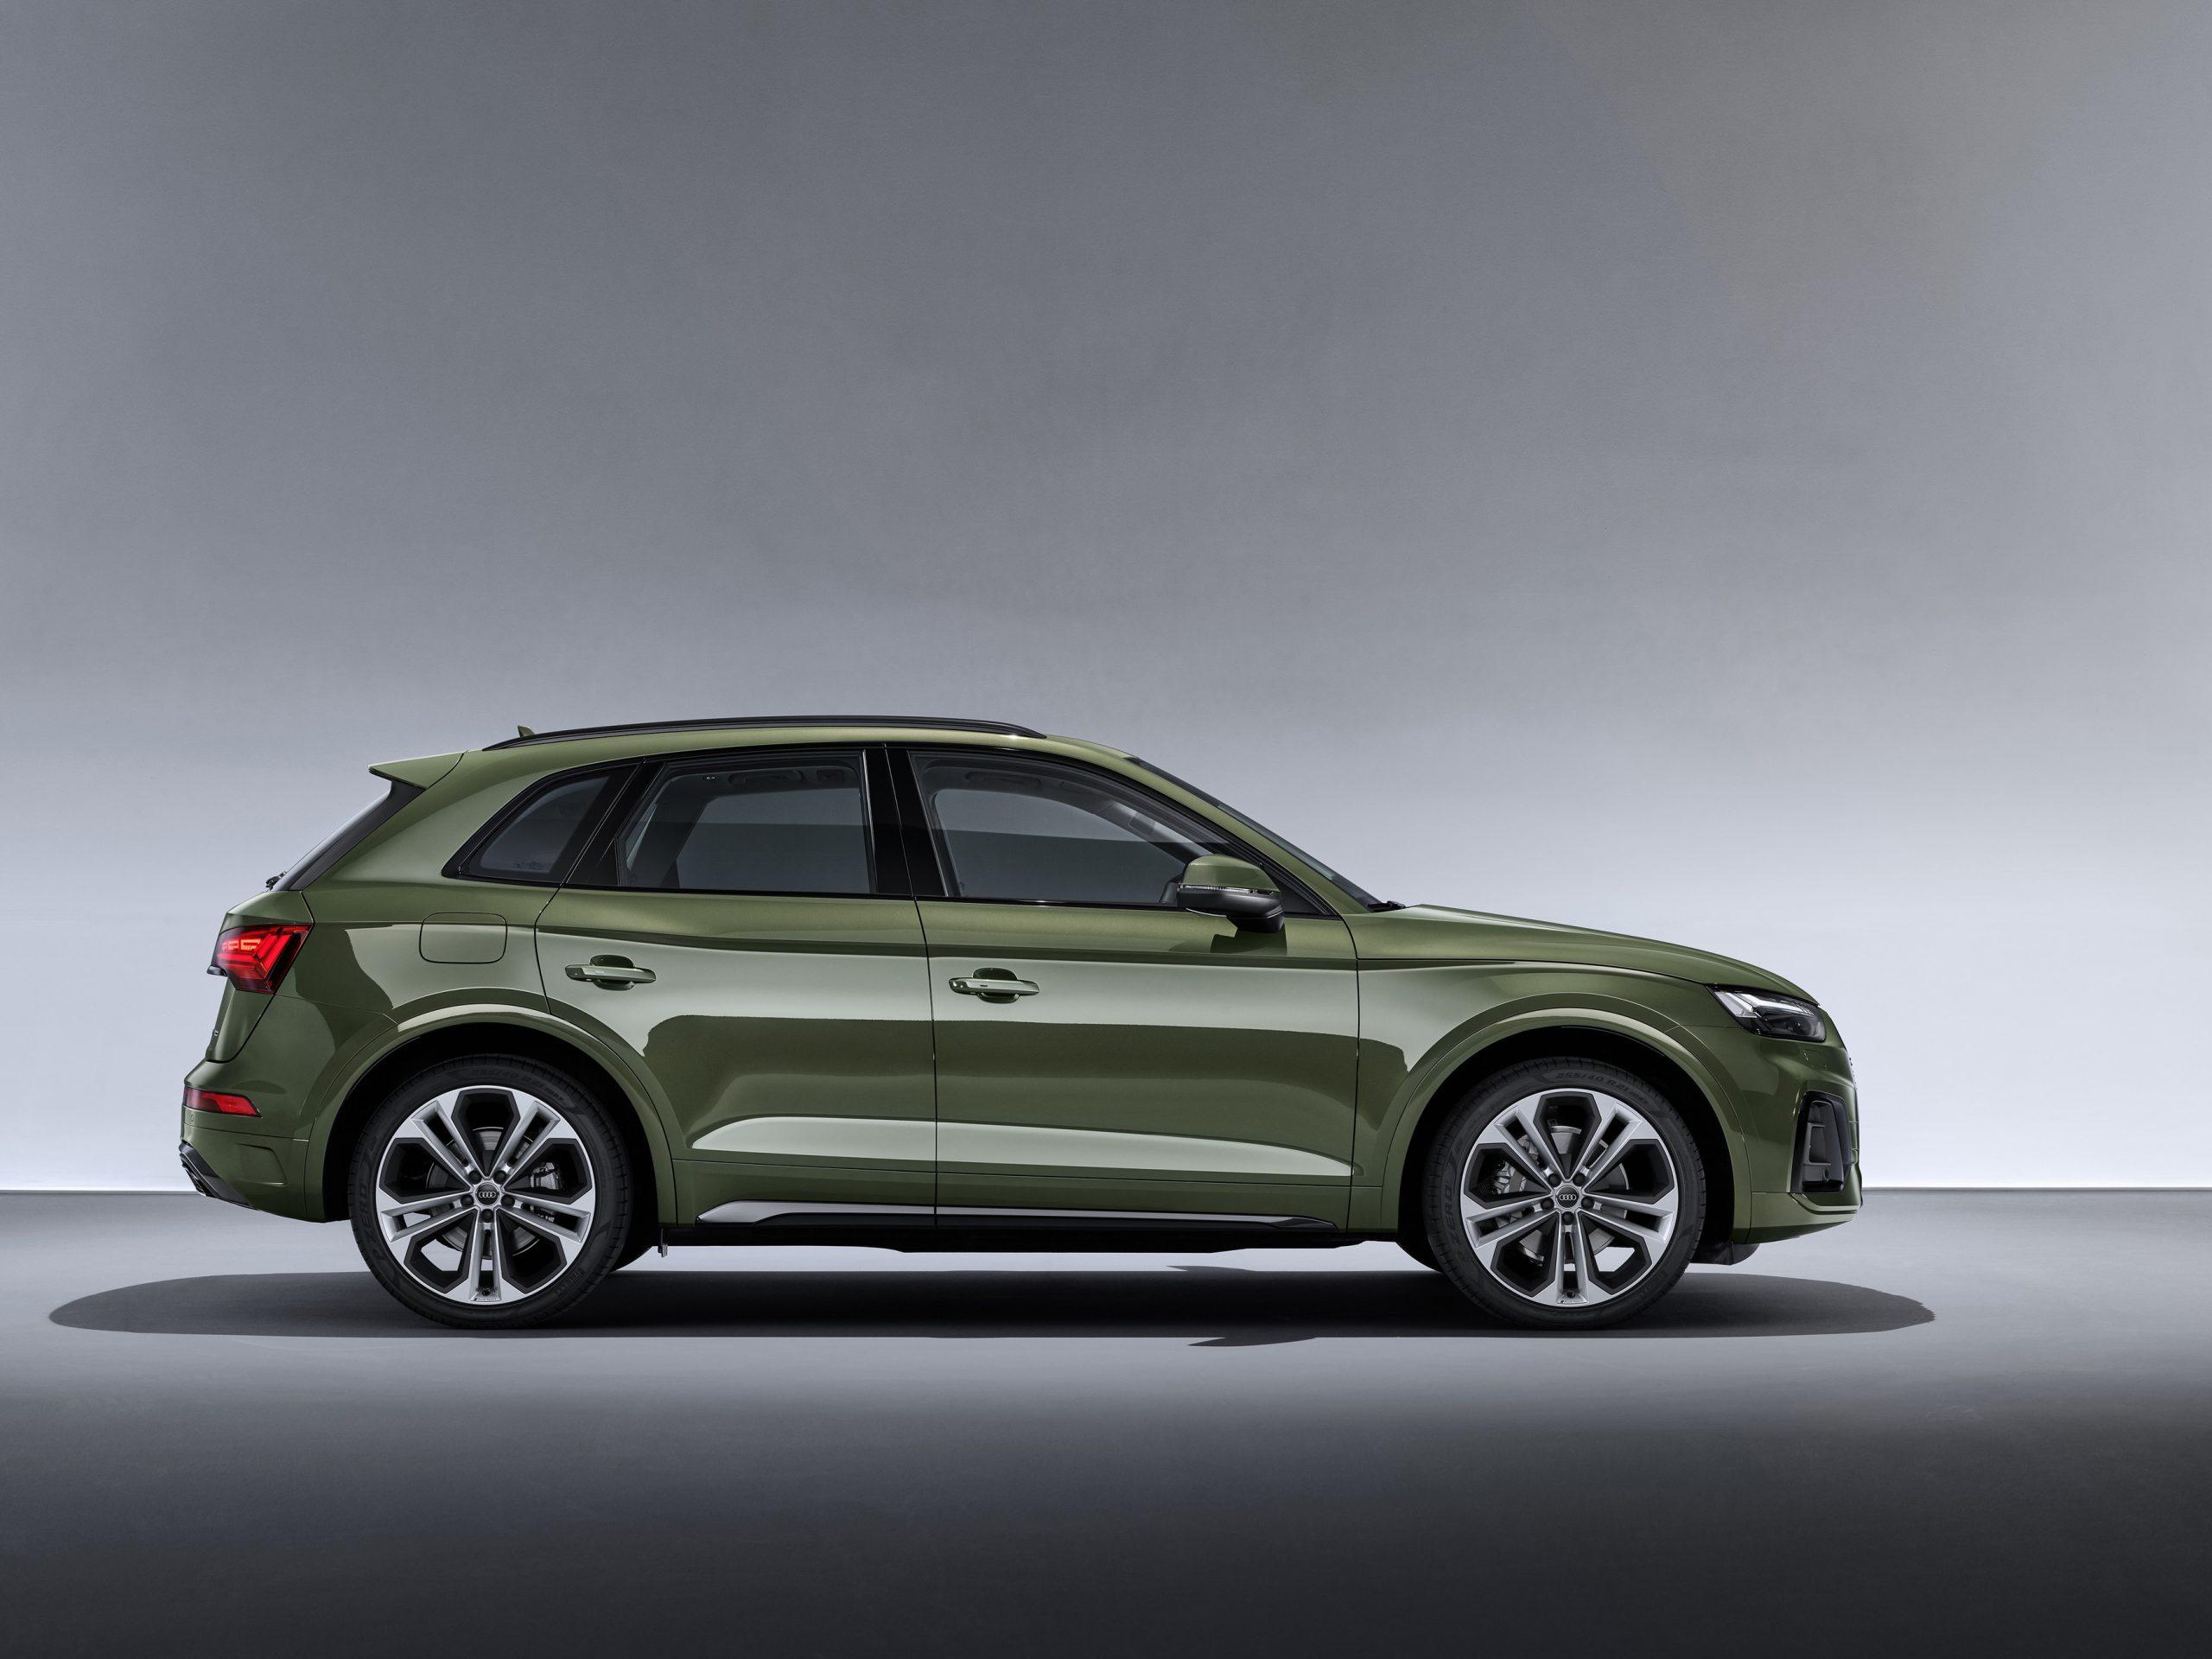 2021 Audi Q5 revealed